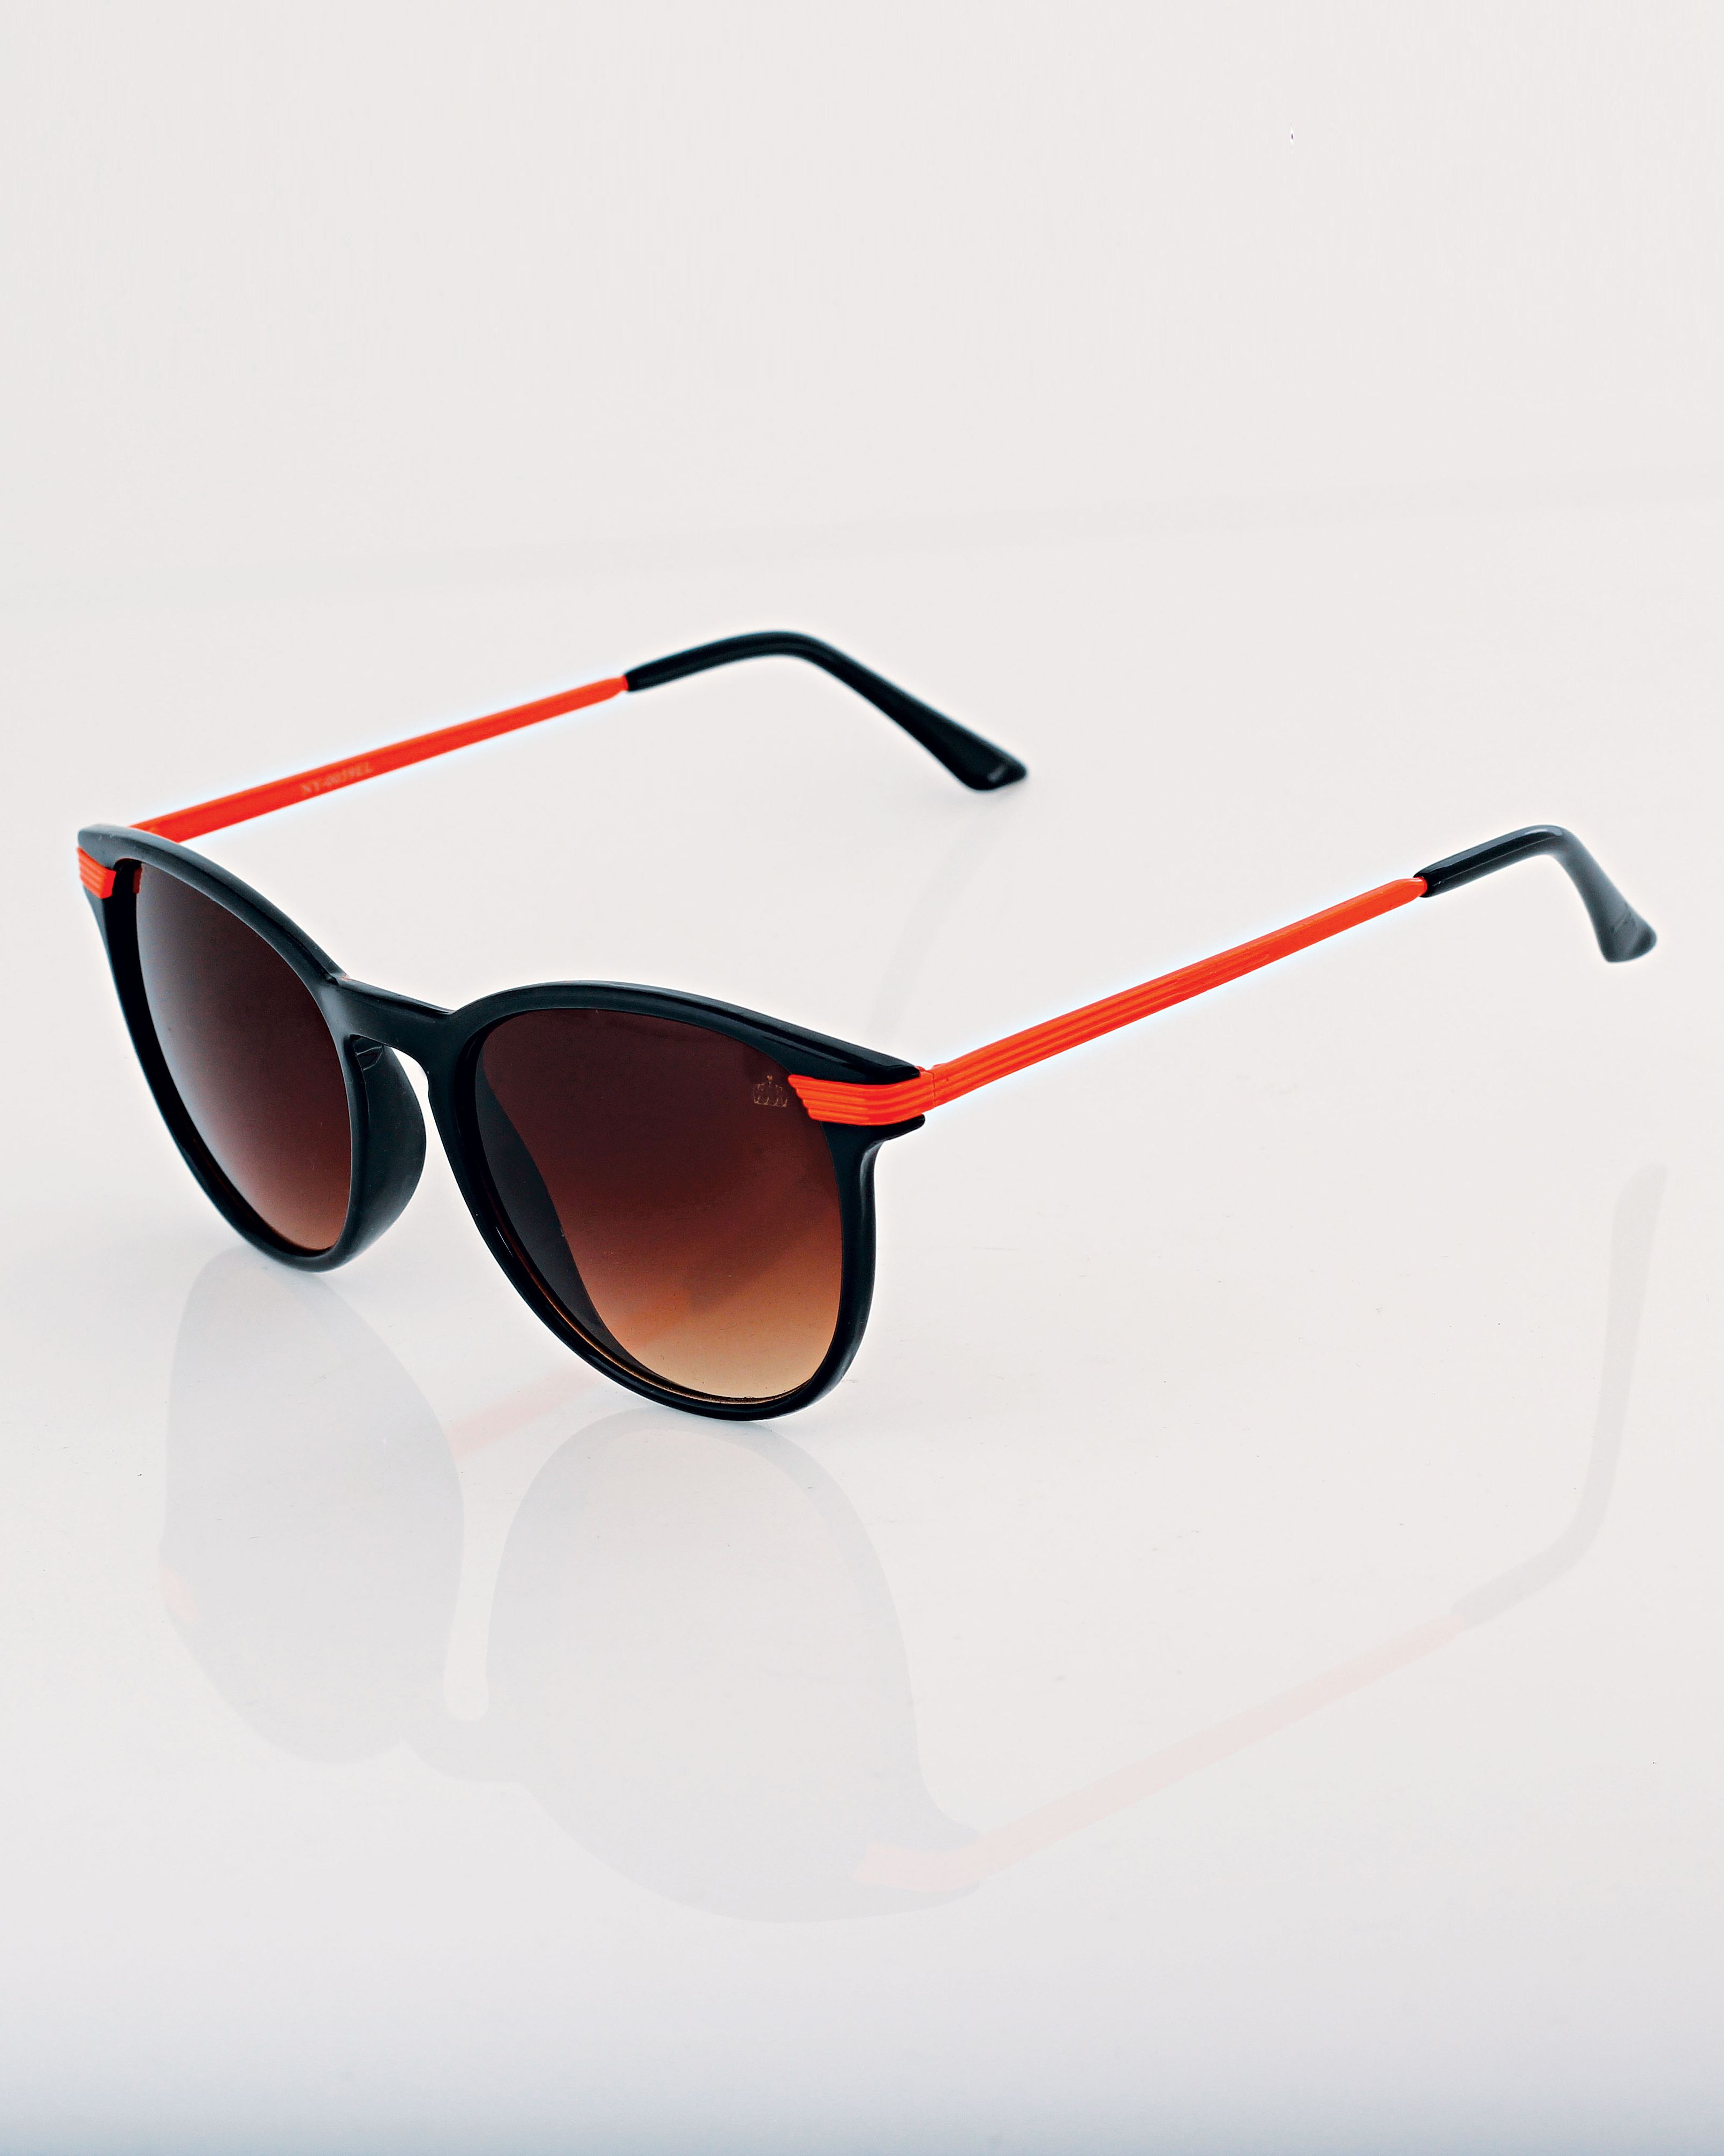 c075585abff7d Óculos vintage preto com detalhes em laranja